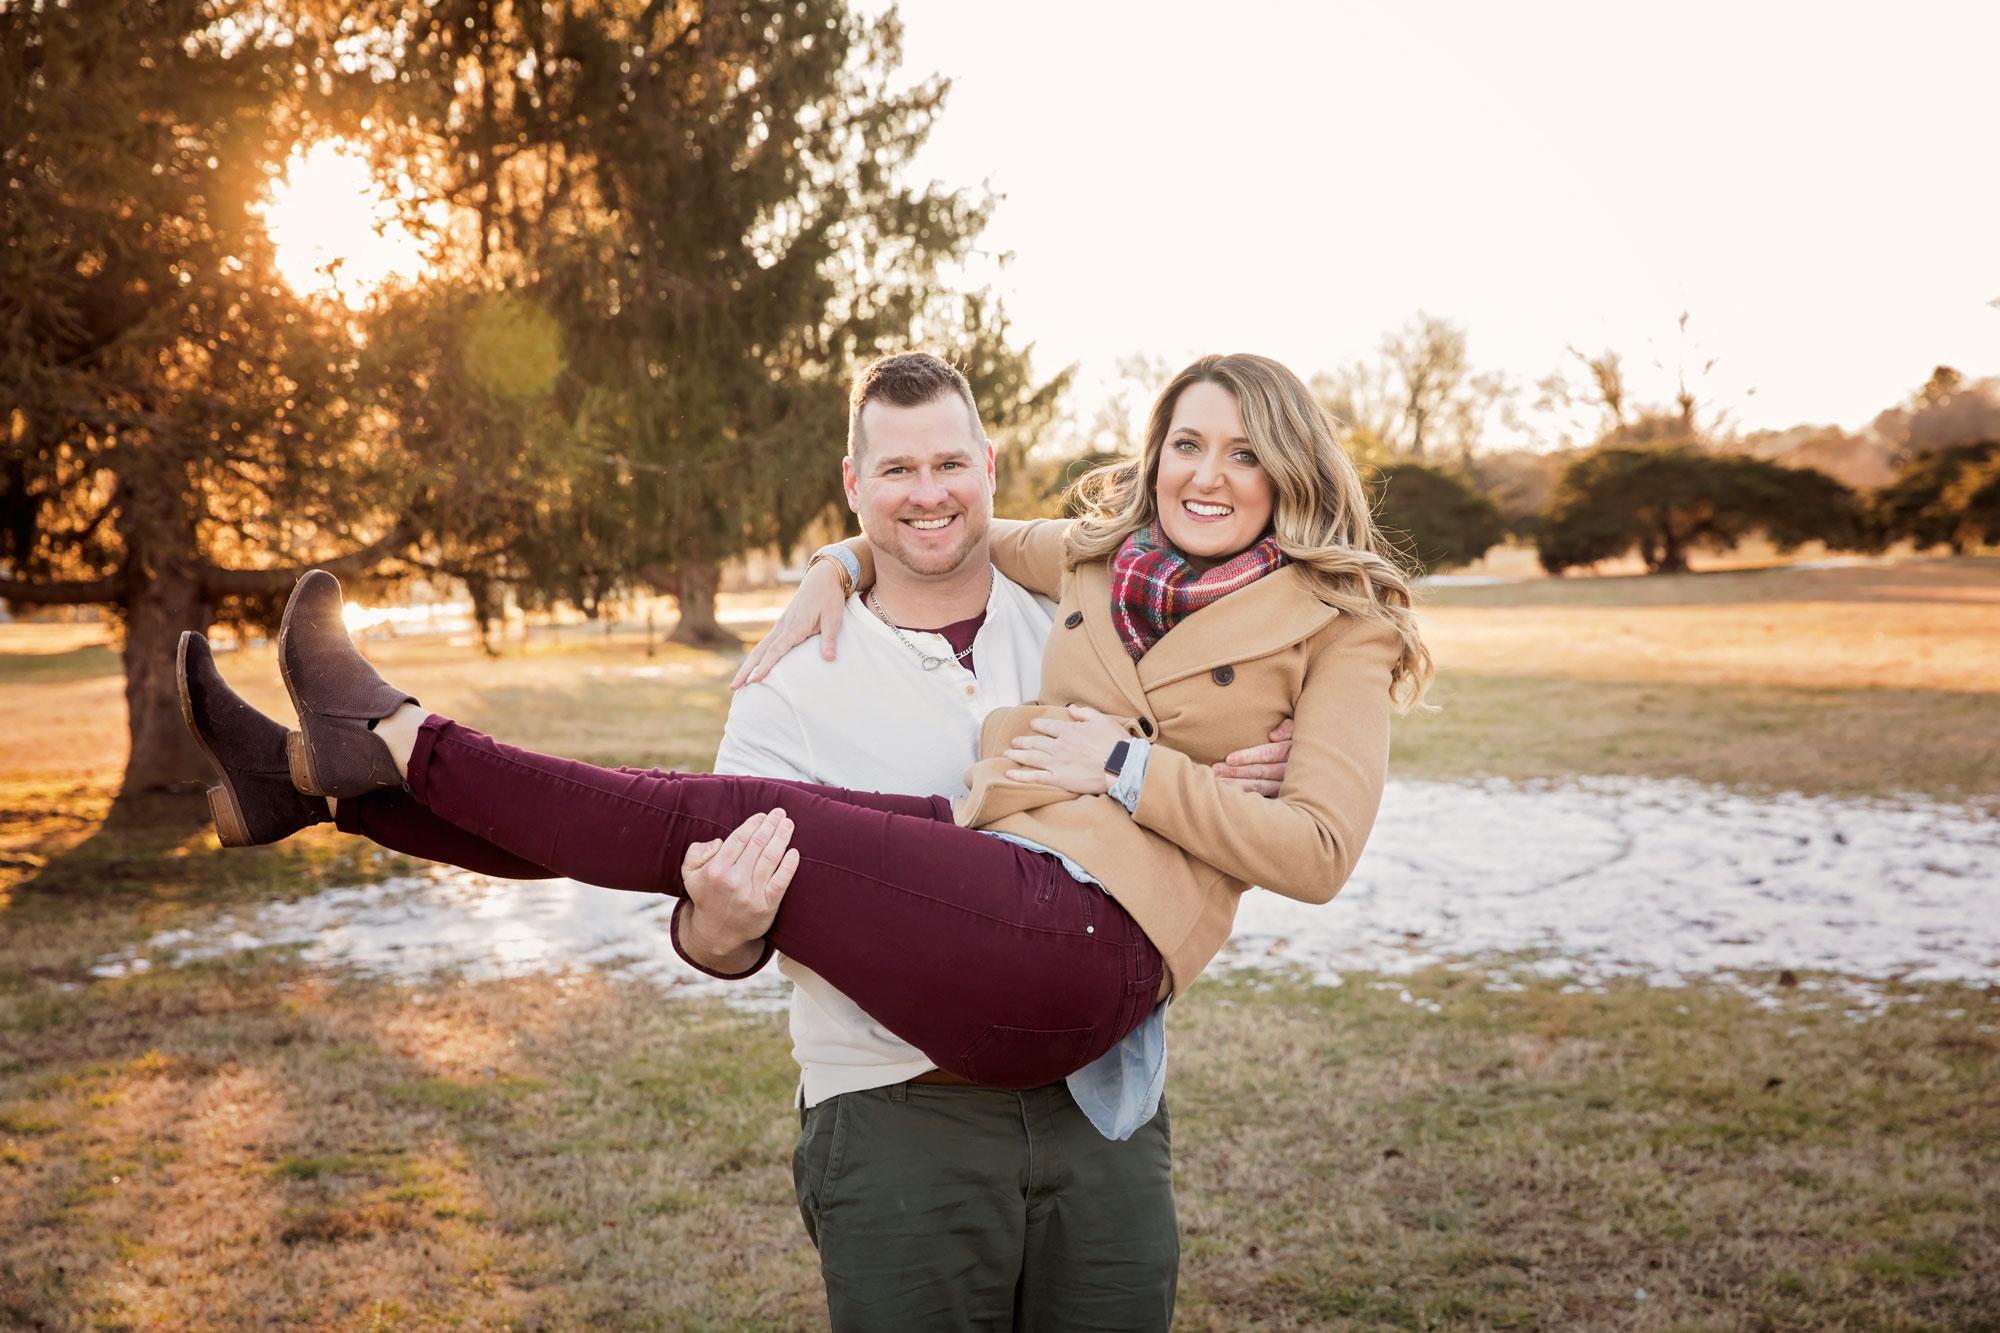 gatlinburg-photographer-couple-picture-goldren-hour.jpg